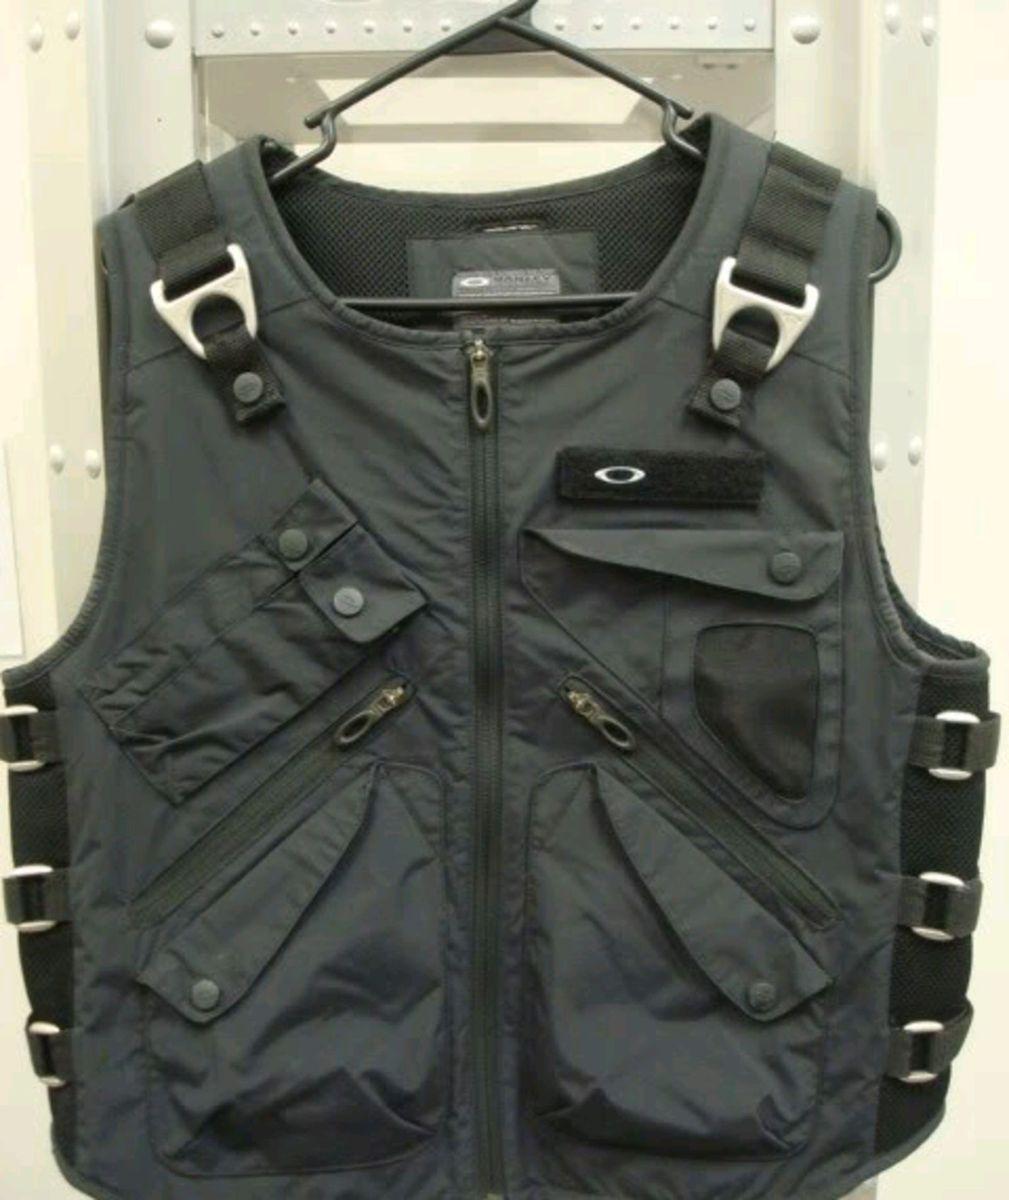 2c9477af54e oakley ap vest masculino - coletes oakley.  Czm6ly9wag90b3muzw5qb2vplmnvbs5ici9wcm9kdwn0cy82mju5nduxlzvkngfhzgnhnguynzbhytu1zgrjnjuwzgvmytc4nta0lmpwzw  ...